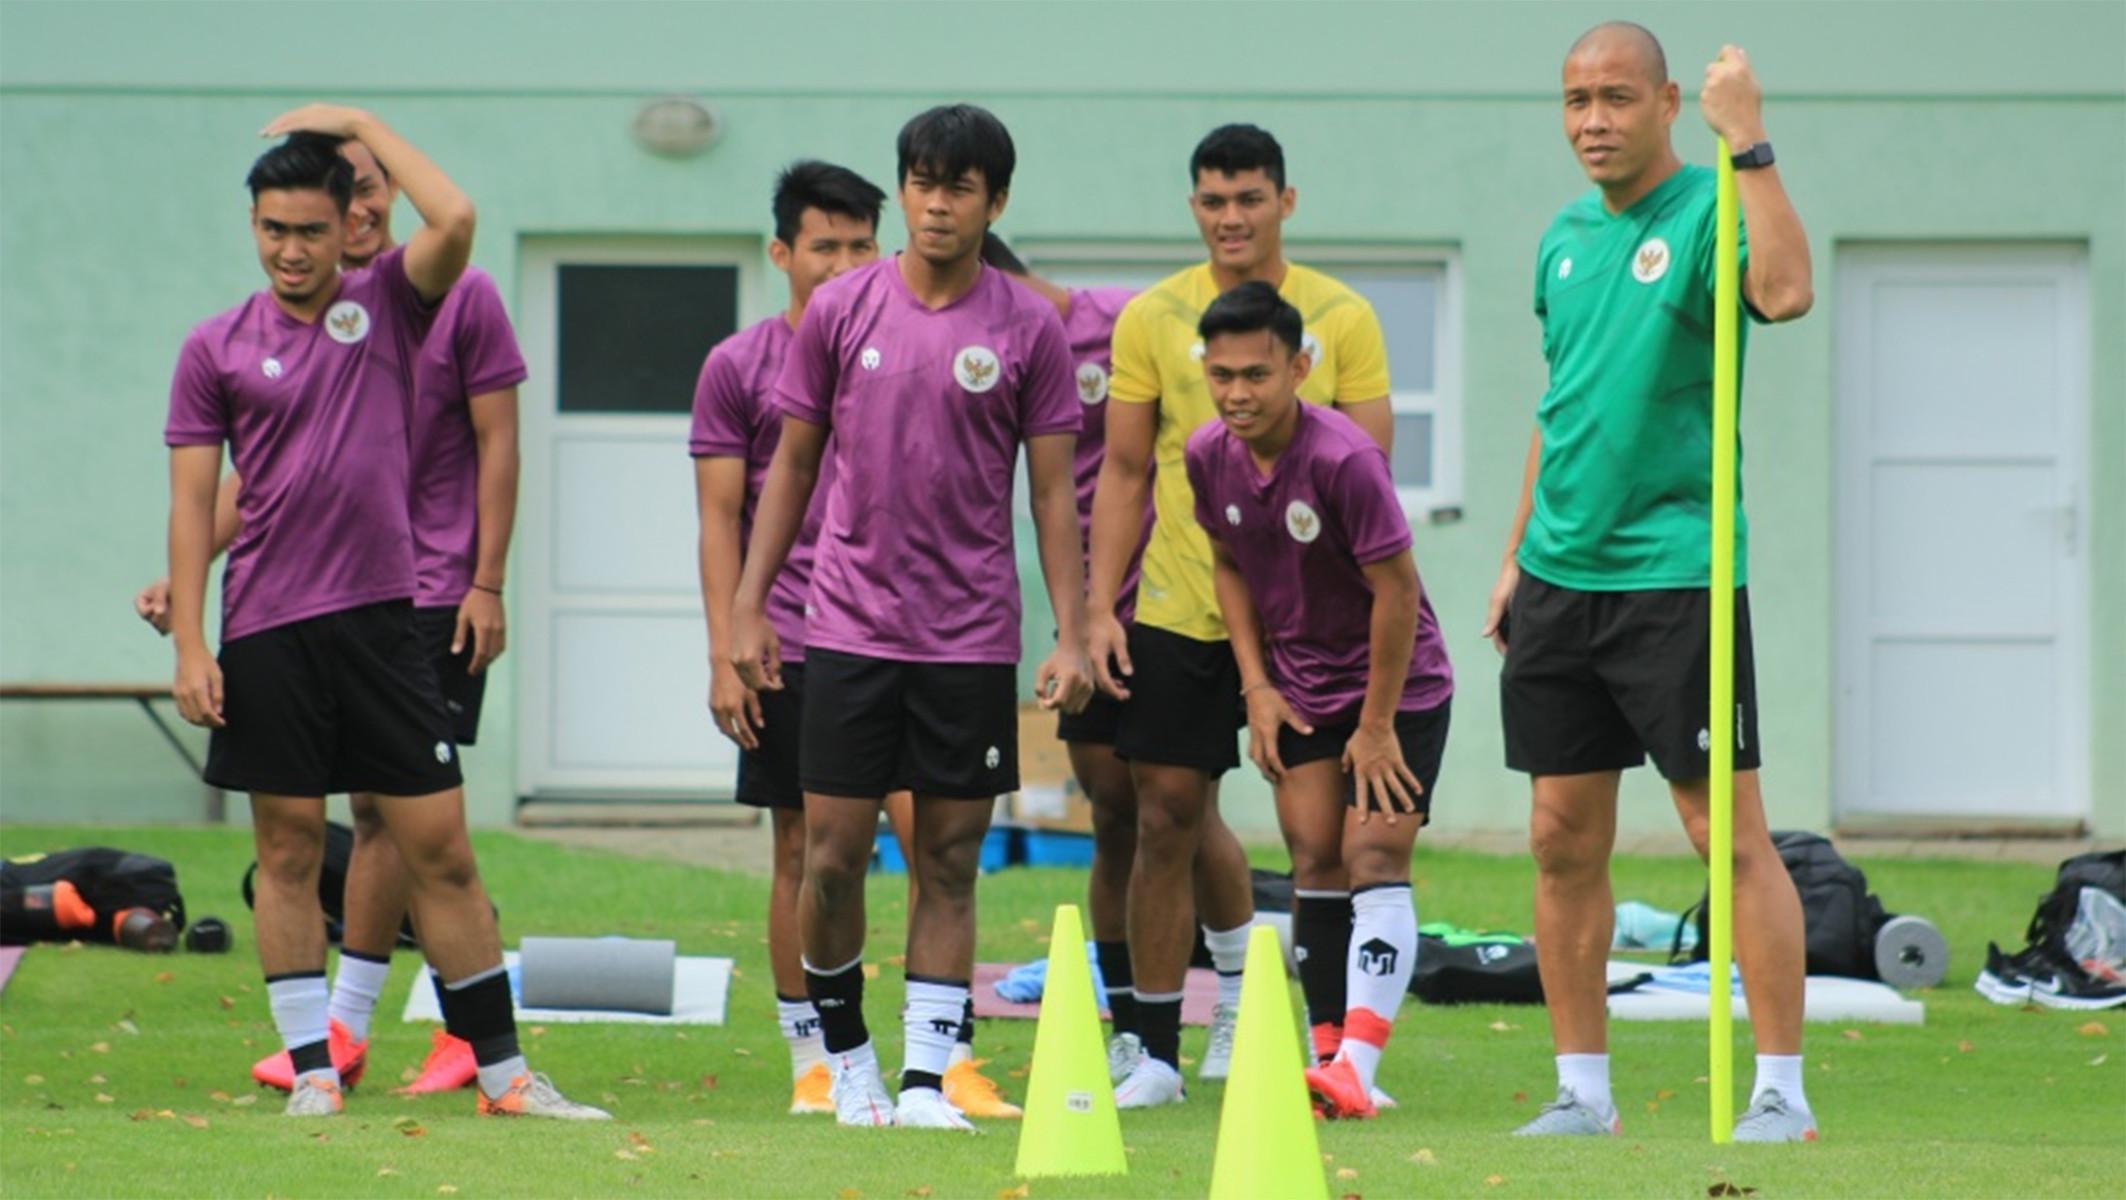 Indonesia U-19 vs Qatar Jilid II, Brylian Aldama: Kami Sudah Tahu Gaya Permainannya - JPNN.com